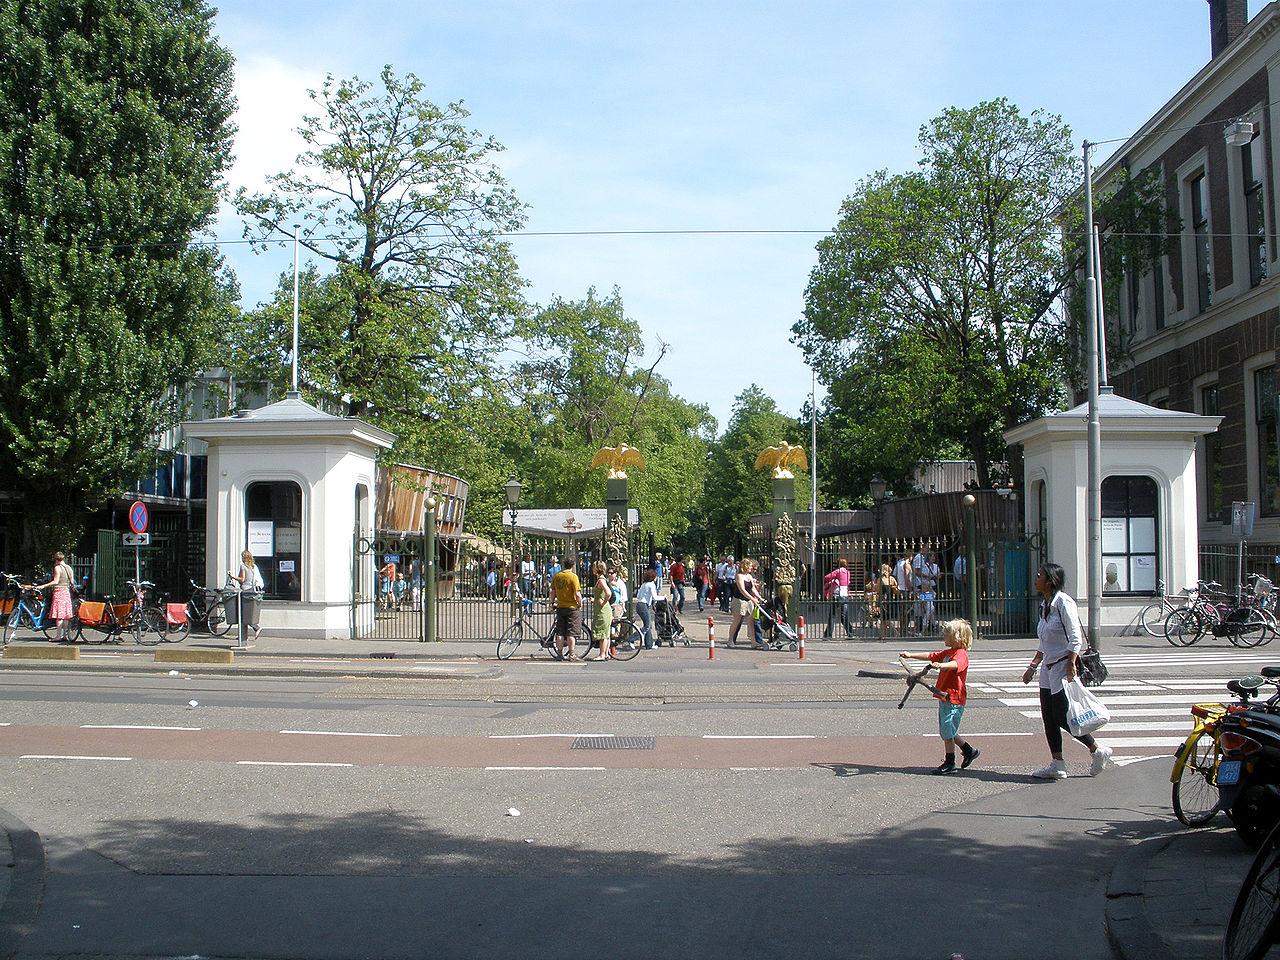 Вход в Artis Royal Zoo, зоопарк в Амстердаме